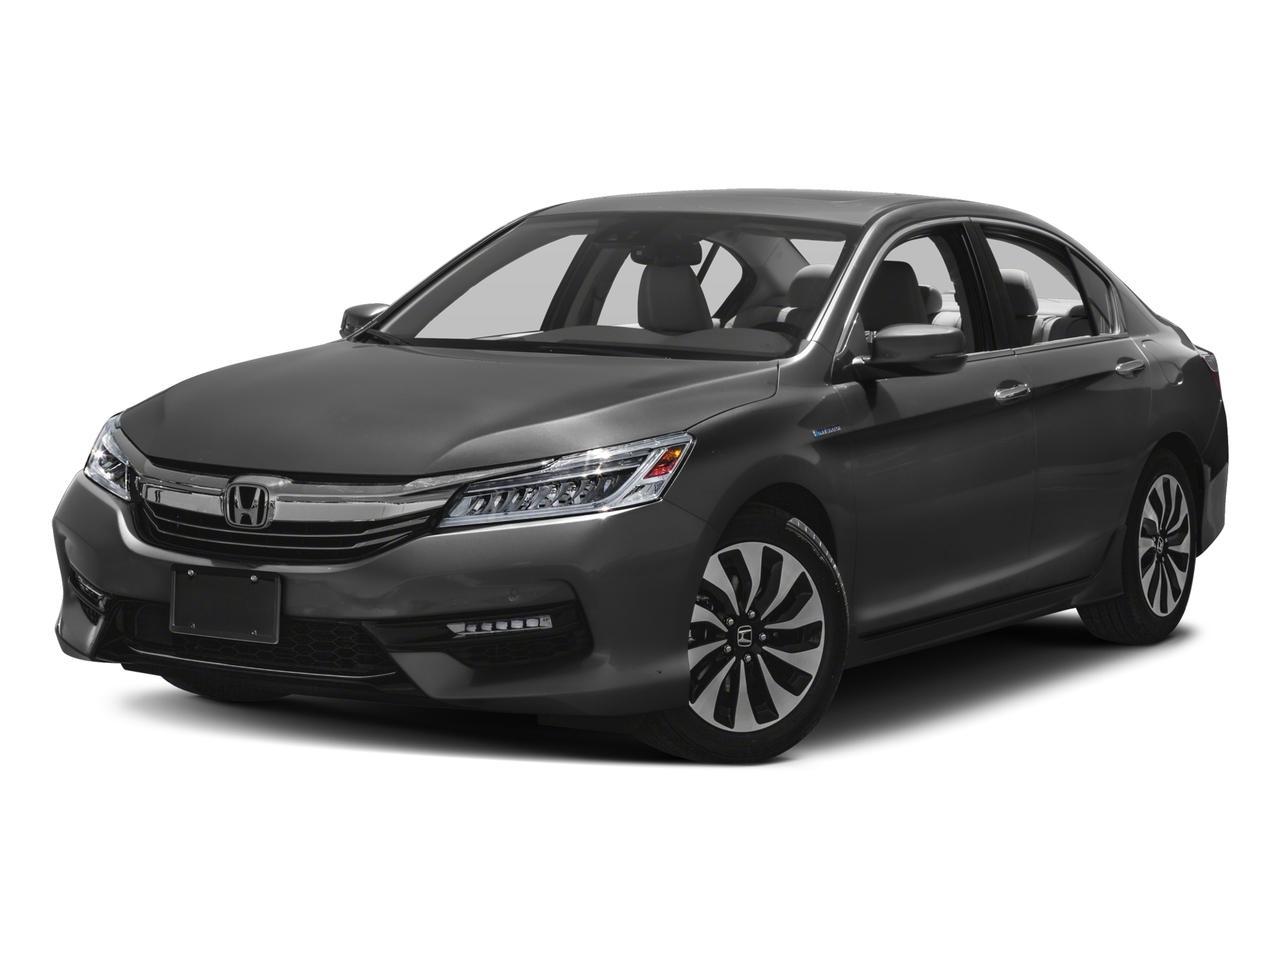 2017 Honda Accord Hybrid Vehicle Photo in Austin, TX 78759